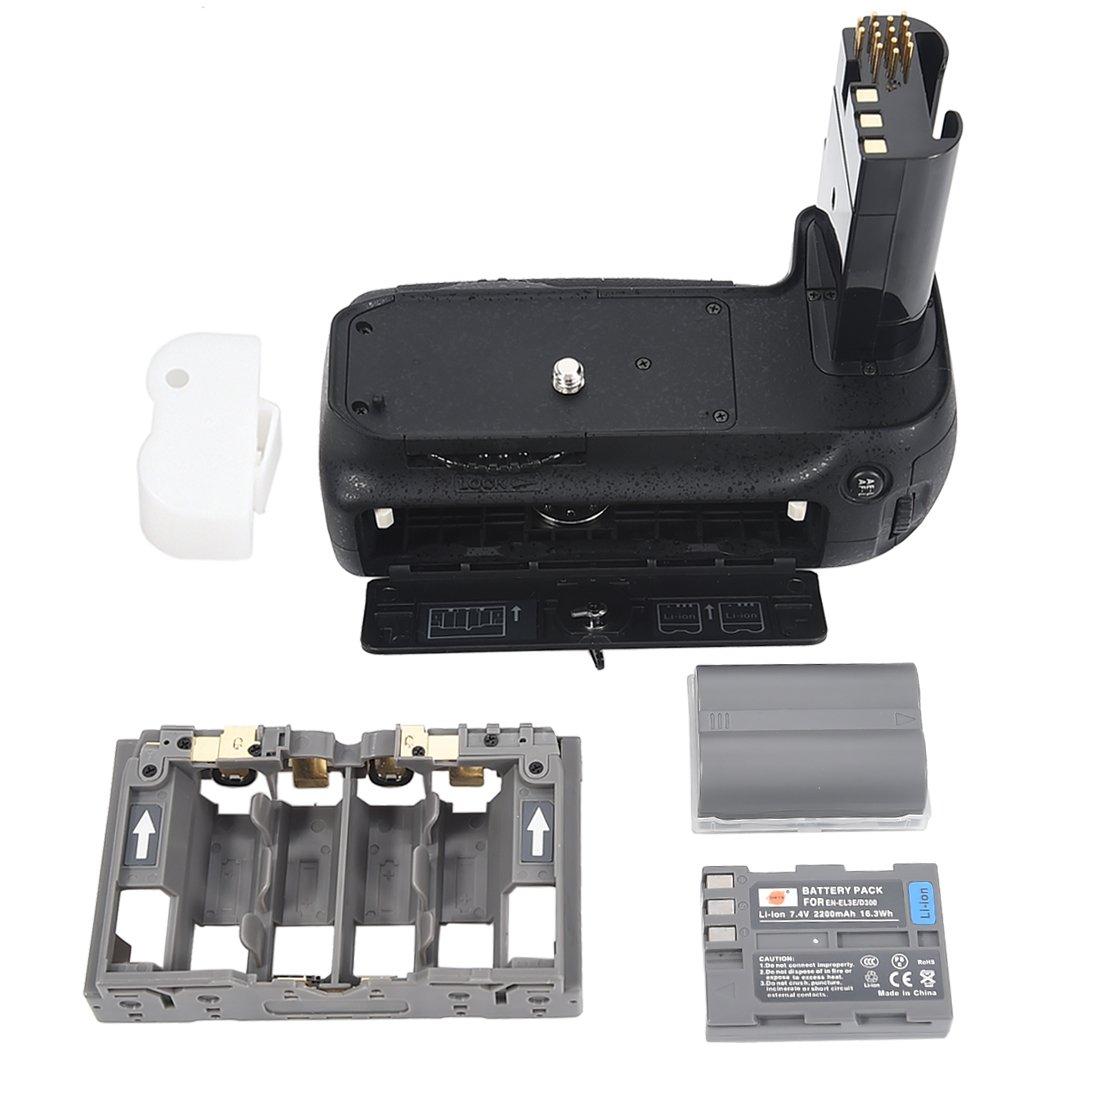 DSTE® Pro MB-D80 Vertical Battery Grip + 2x EN-EL3E for Nikon D80 D90 SLR Digital Camera DST Electron Technological Co. Ltd DTC25B2